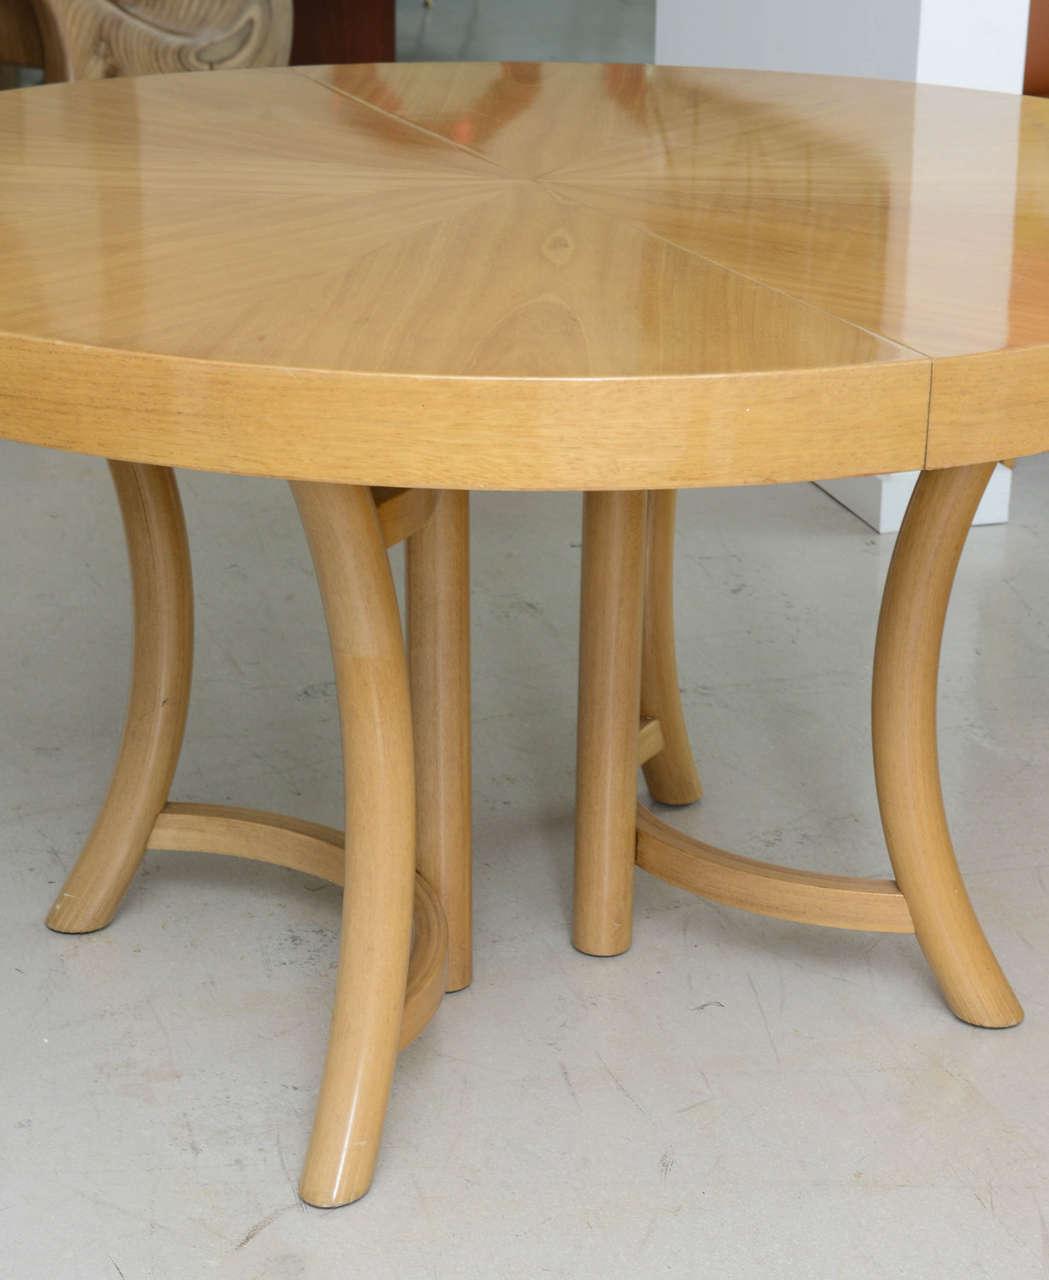 Klismos Style Circular Dining Table at 1stdibs : DSC4911 from www.1stdibs.com size 1049 x 1280 jpeg 72kB